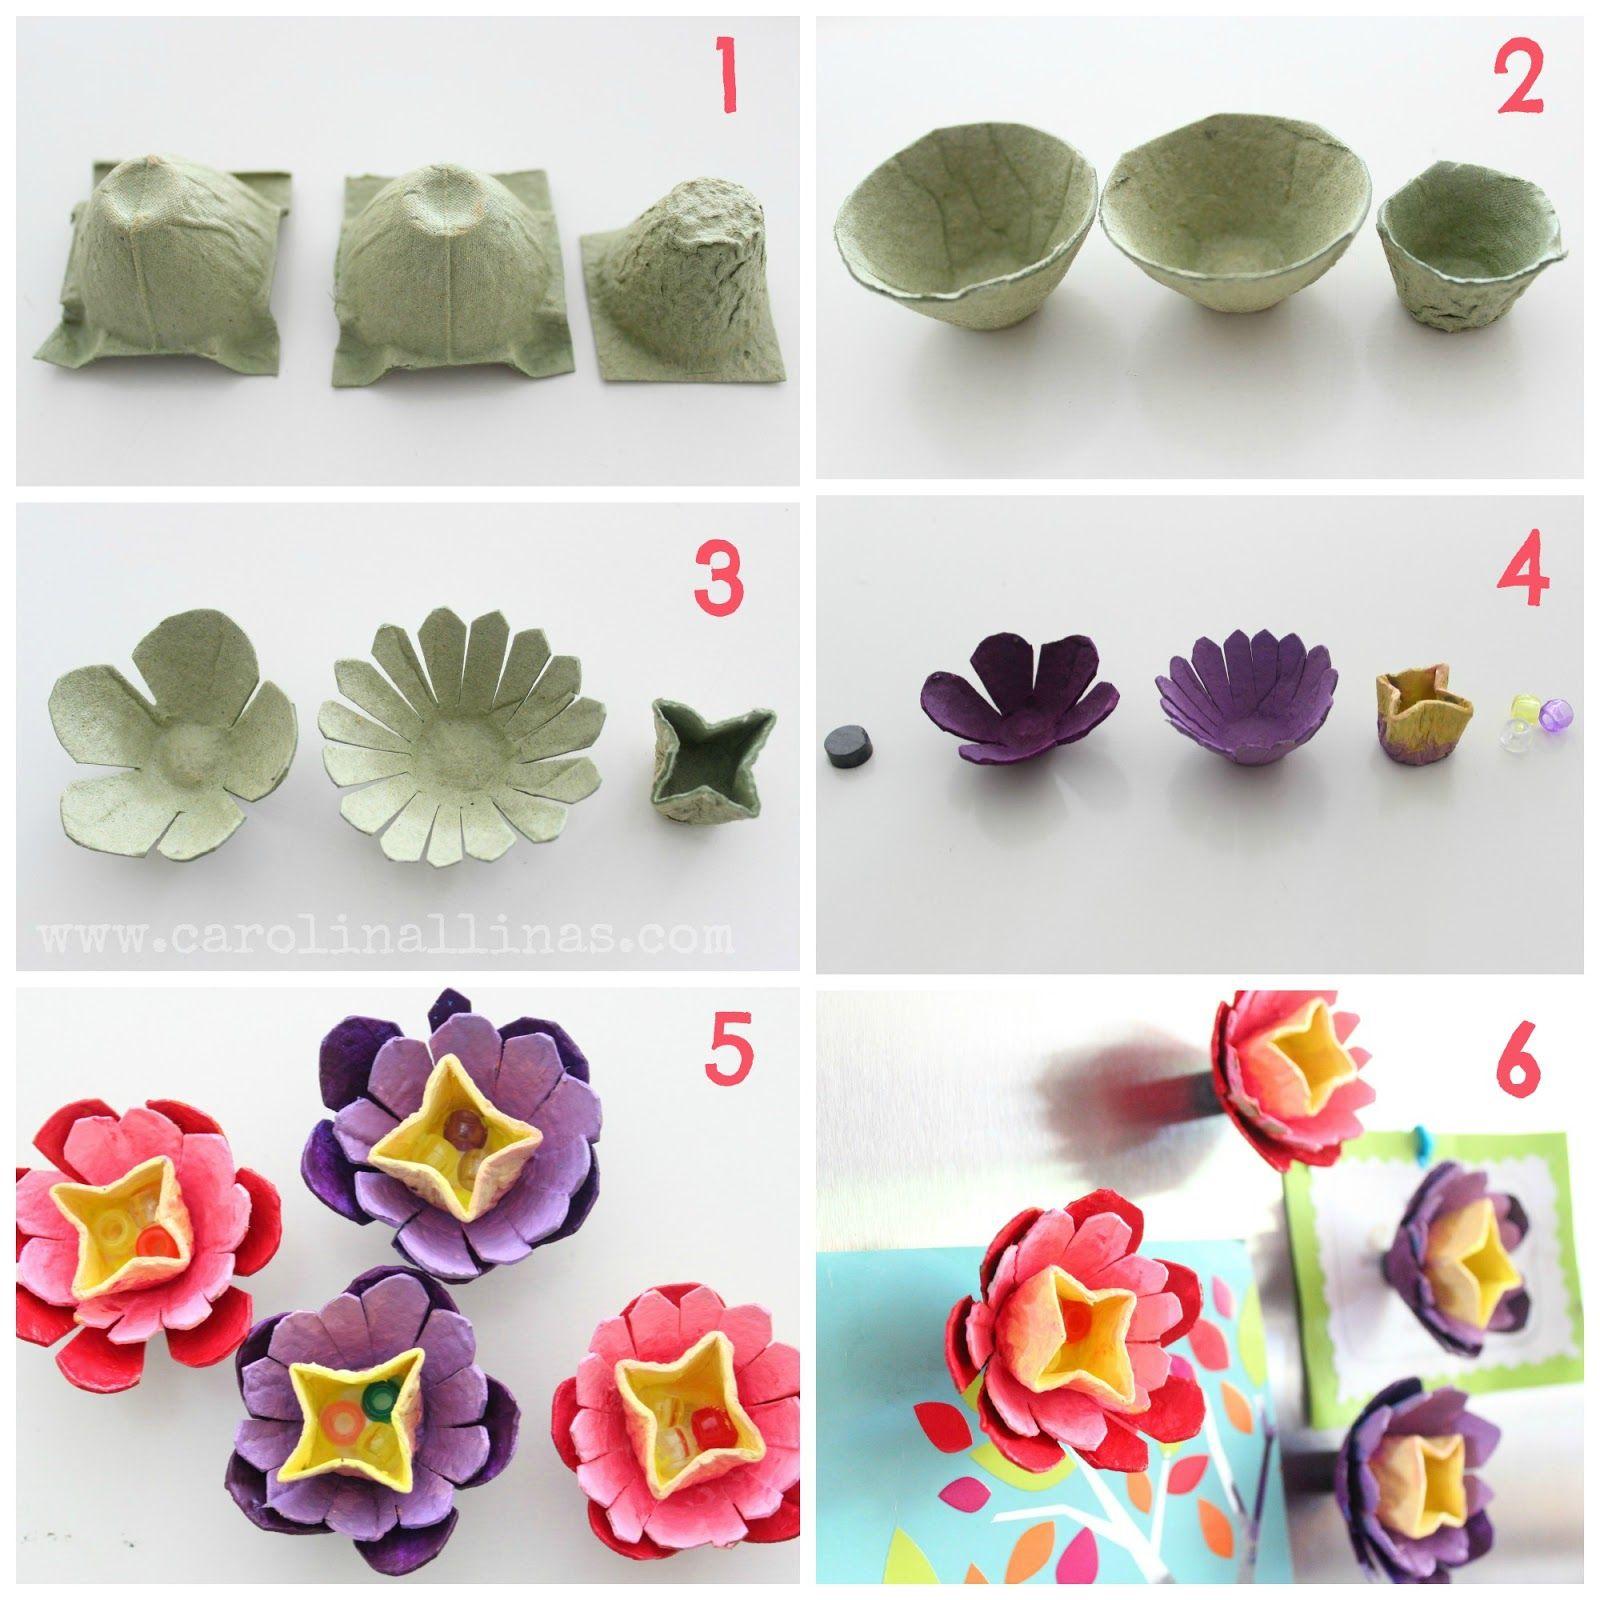 Artividades Imanes De Flores Hechas Con Cajas De Huevo Flores De Caja De Huevos Cajas De Huevo Cubetas De Huevos